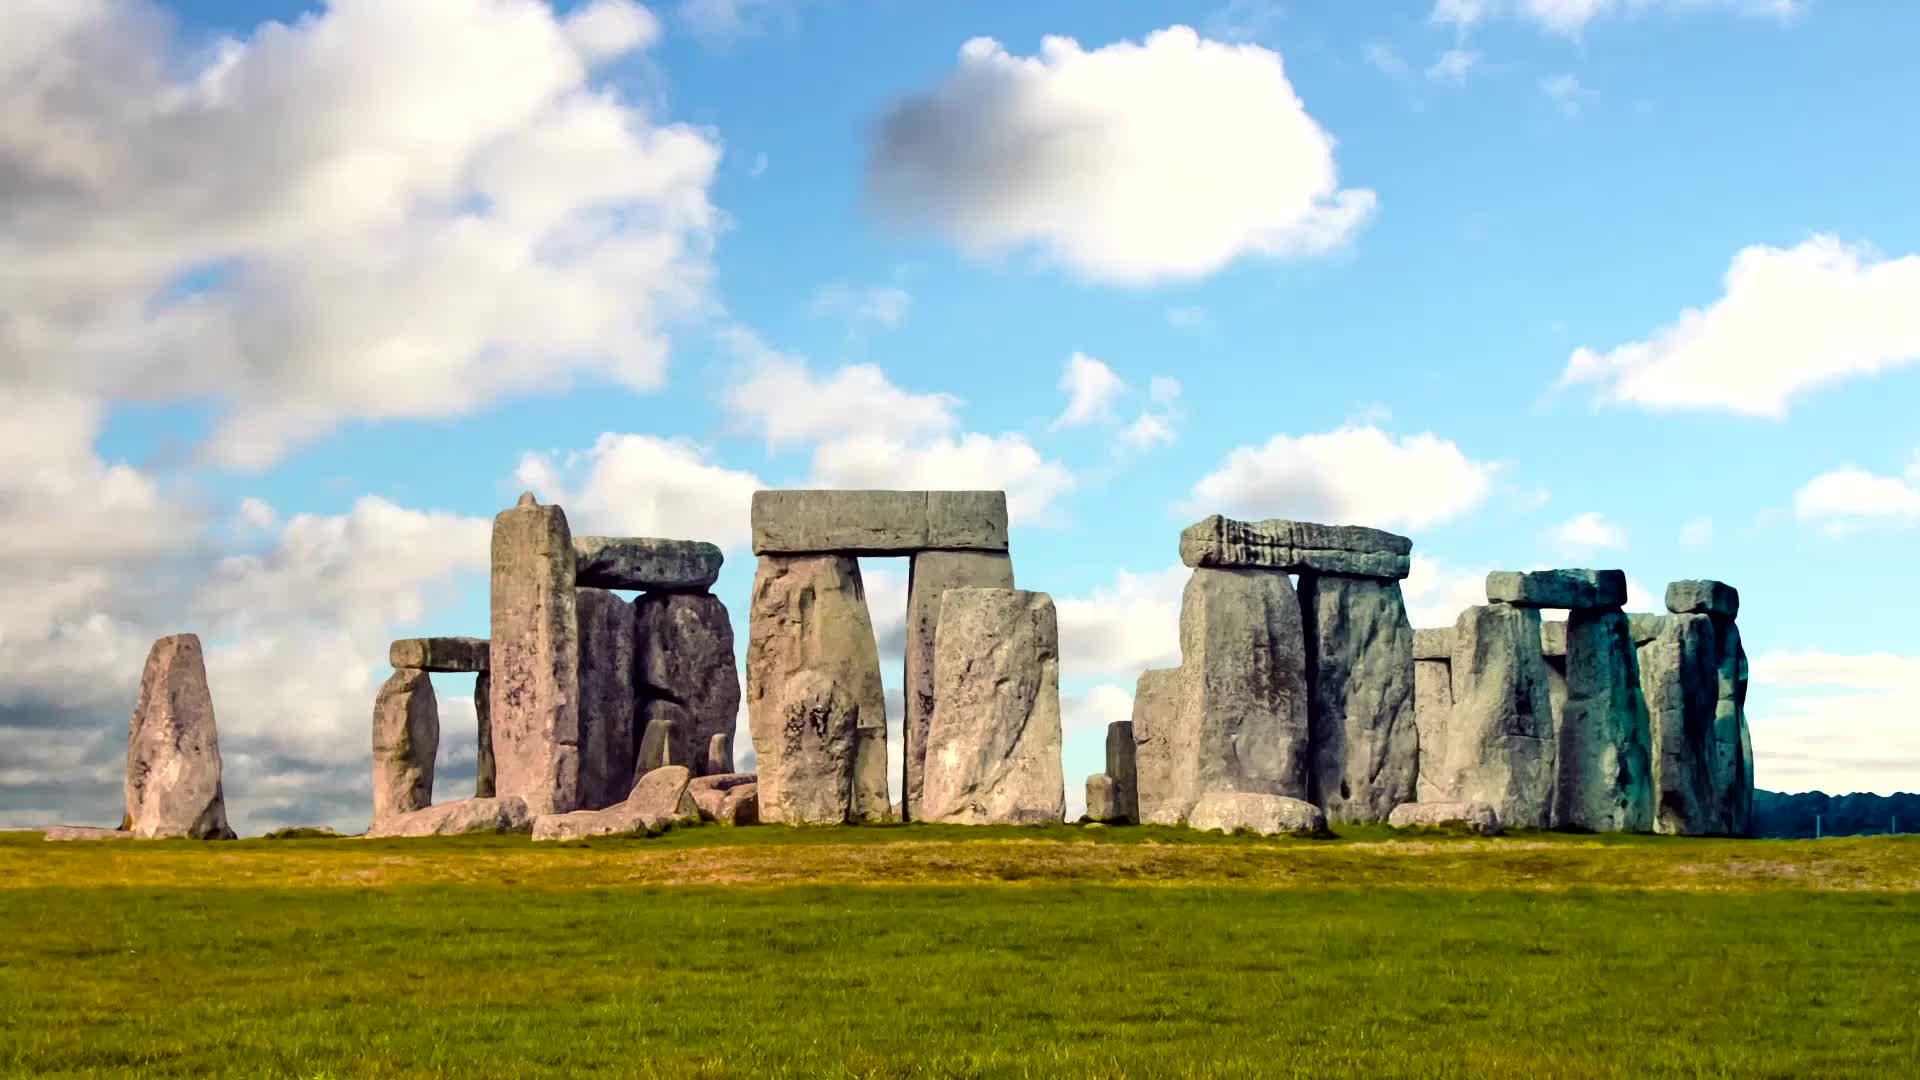 Enormous Neolithic-Era Monument Found Hiding in Plain Sight Near Stonehenge